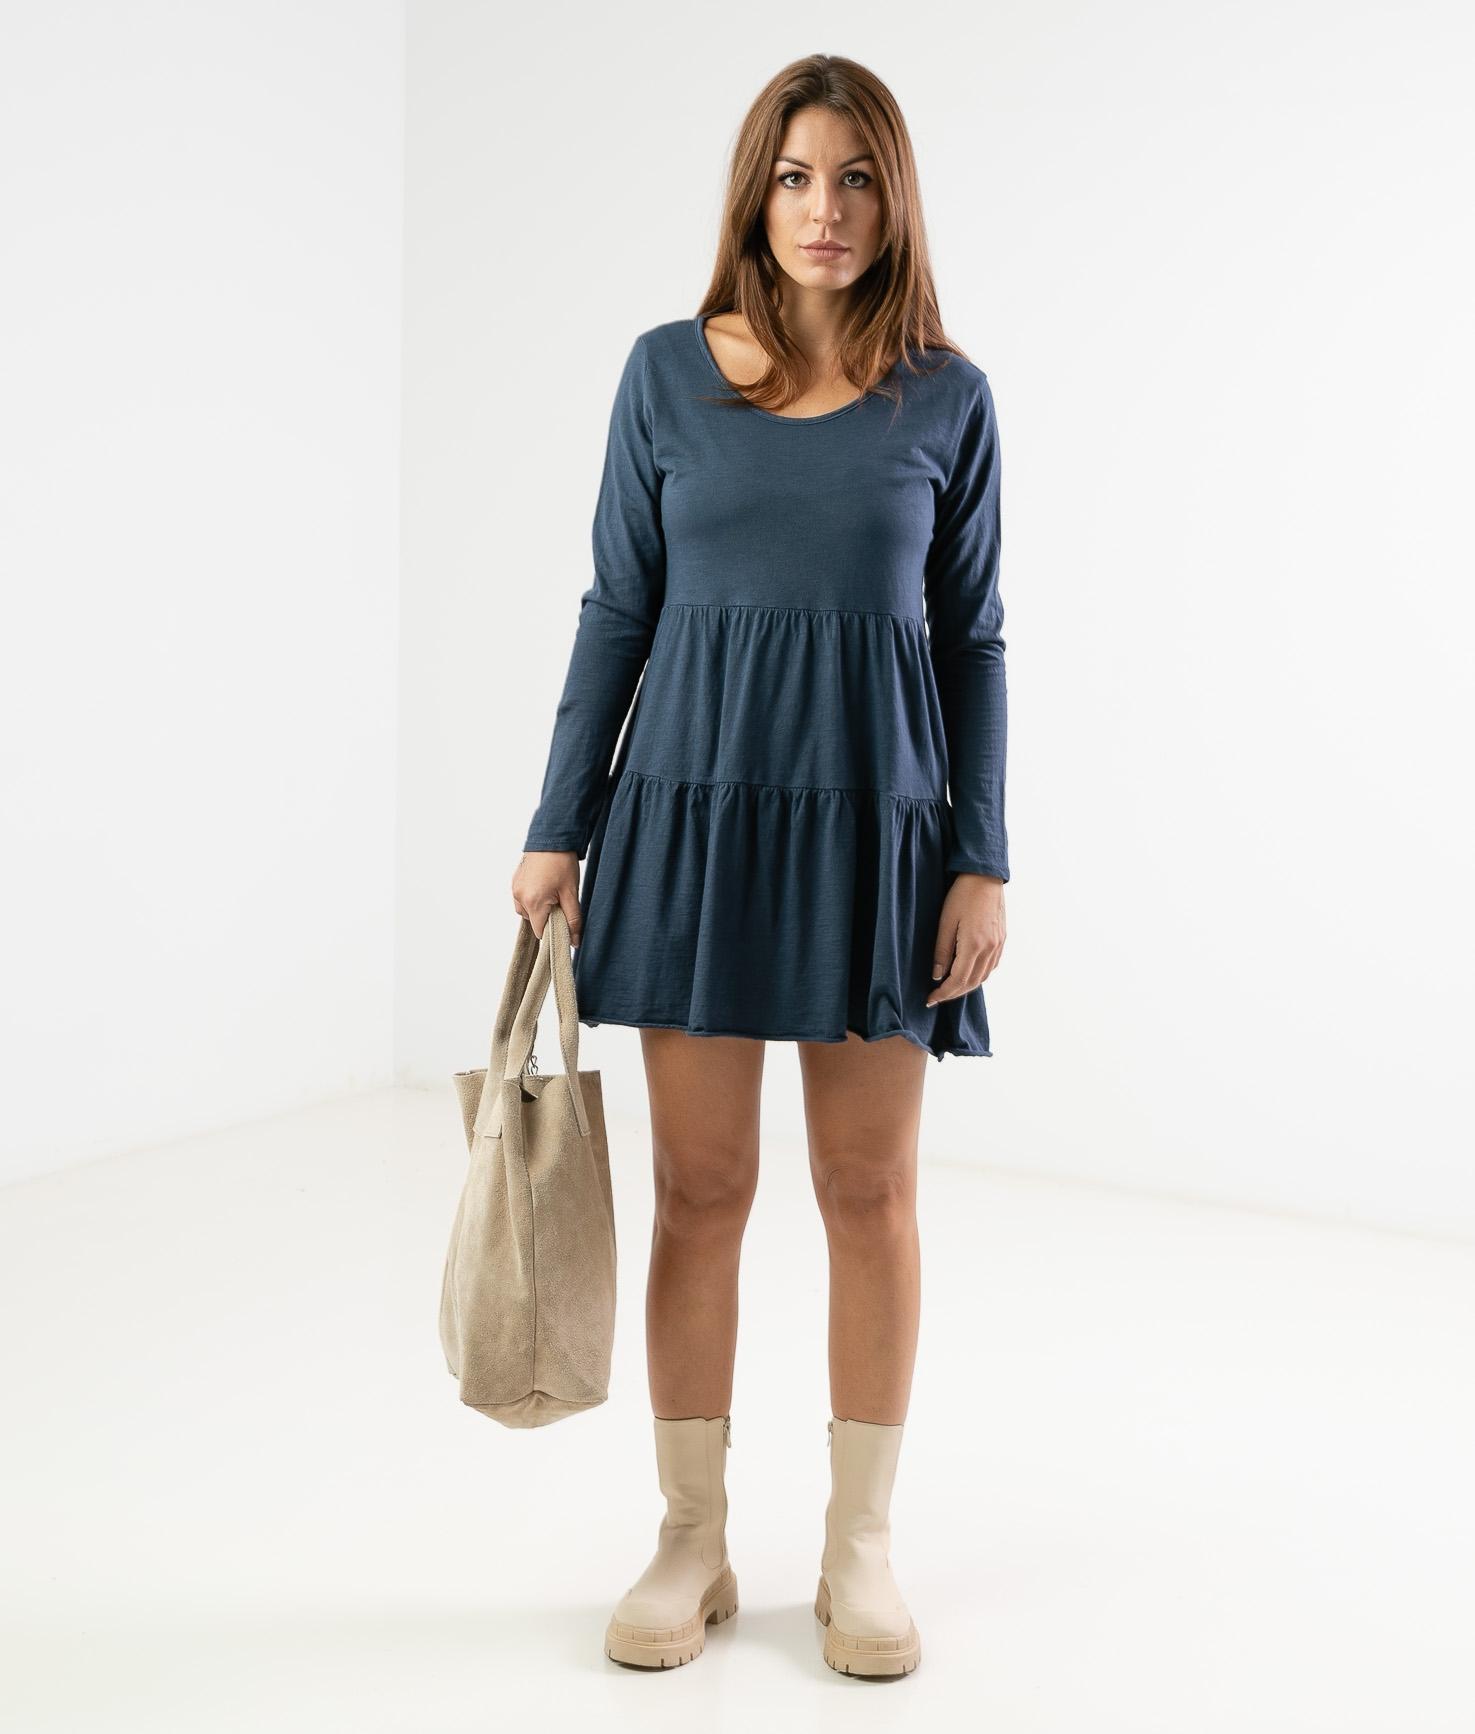 CIMERA DRESS - DARK BLUE